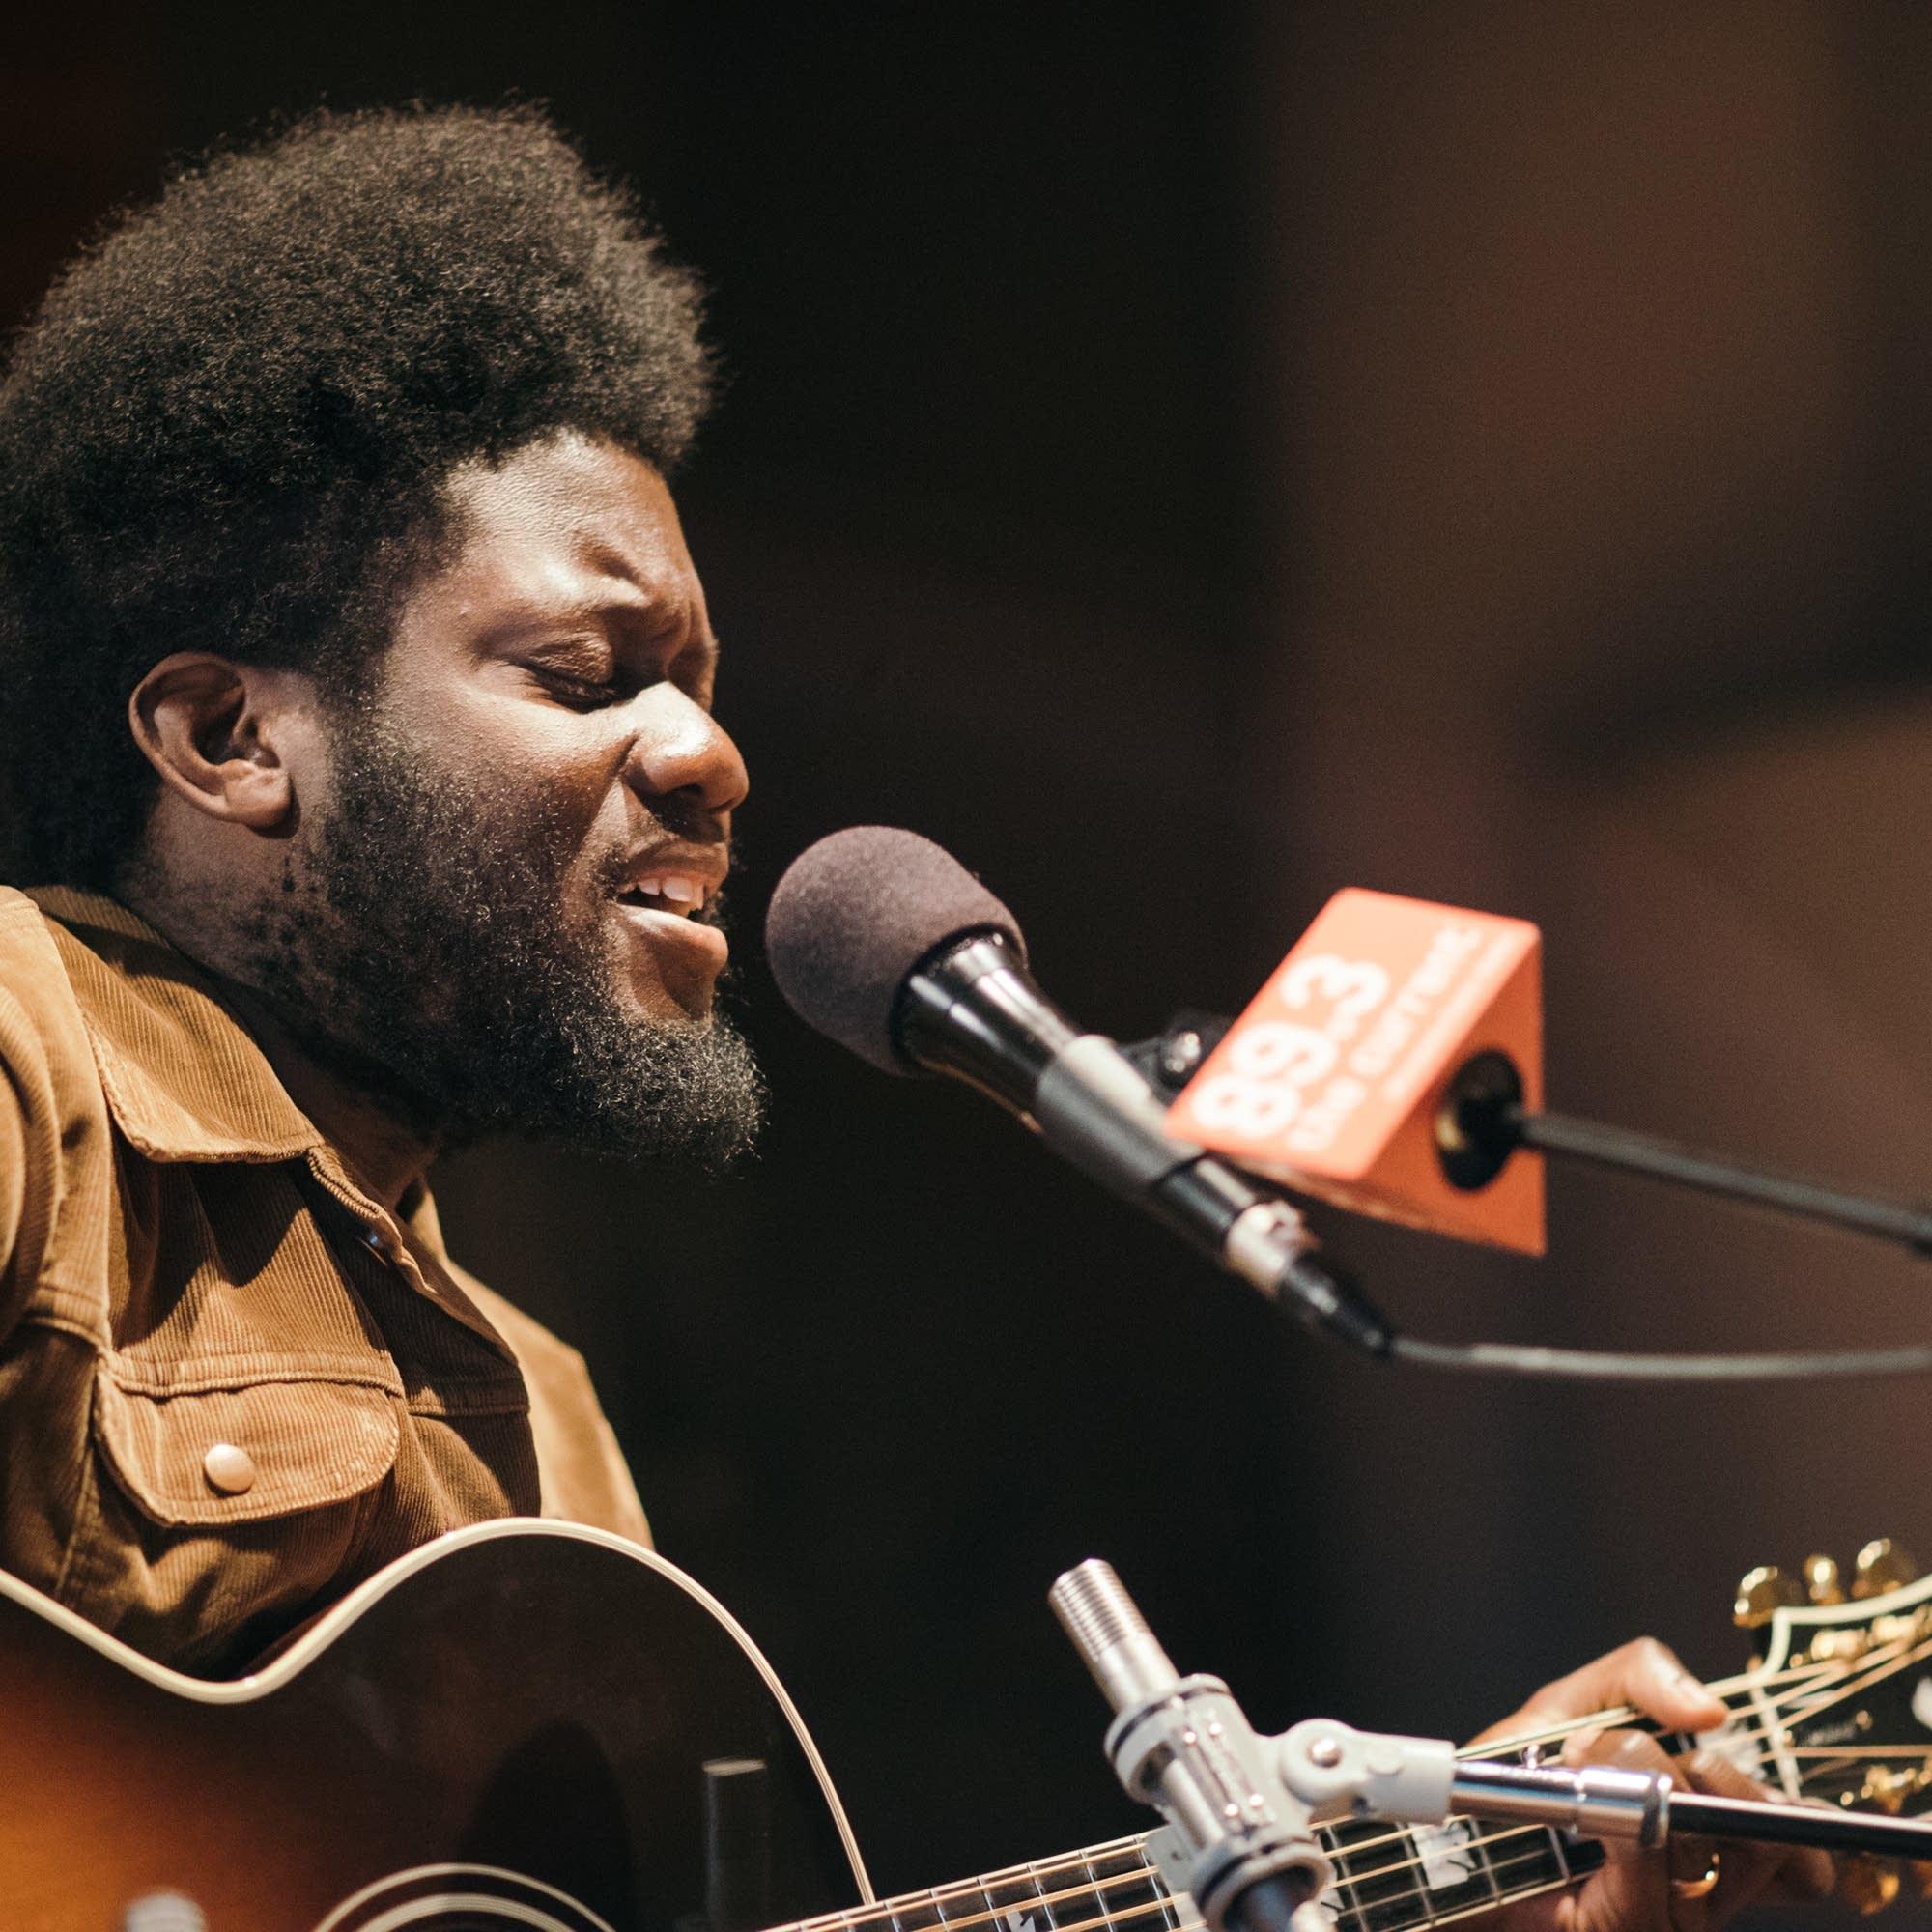 Michael Kiwanuka performs in The Current's studios